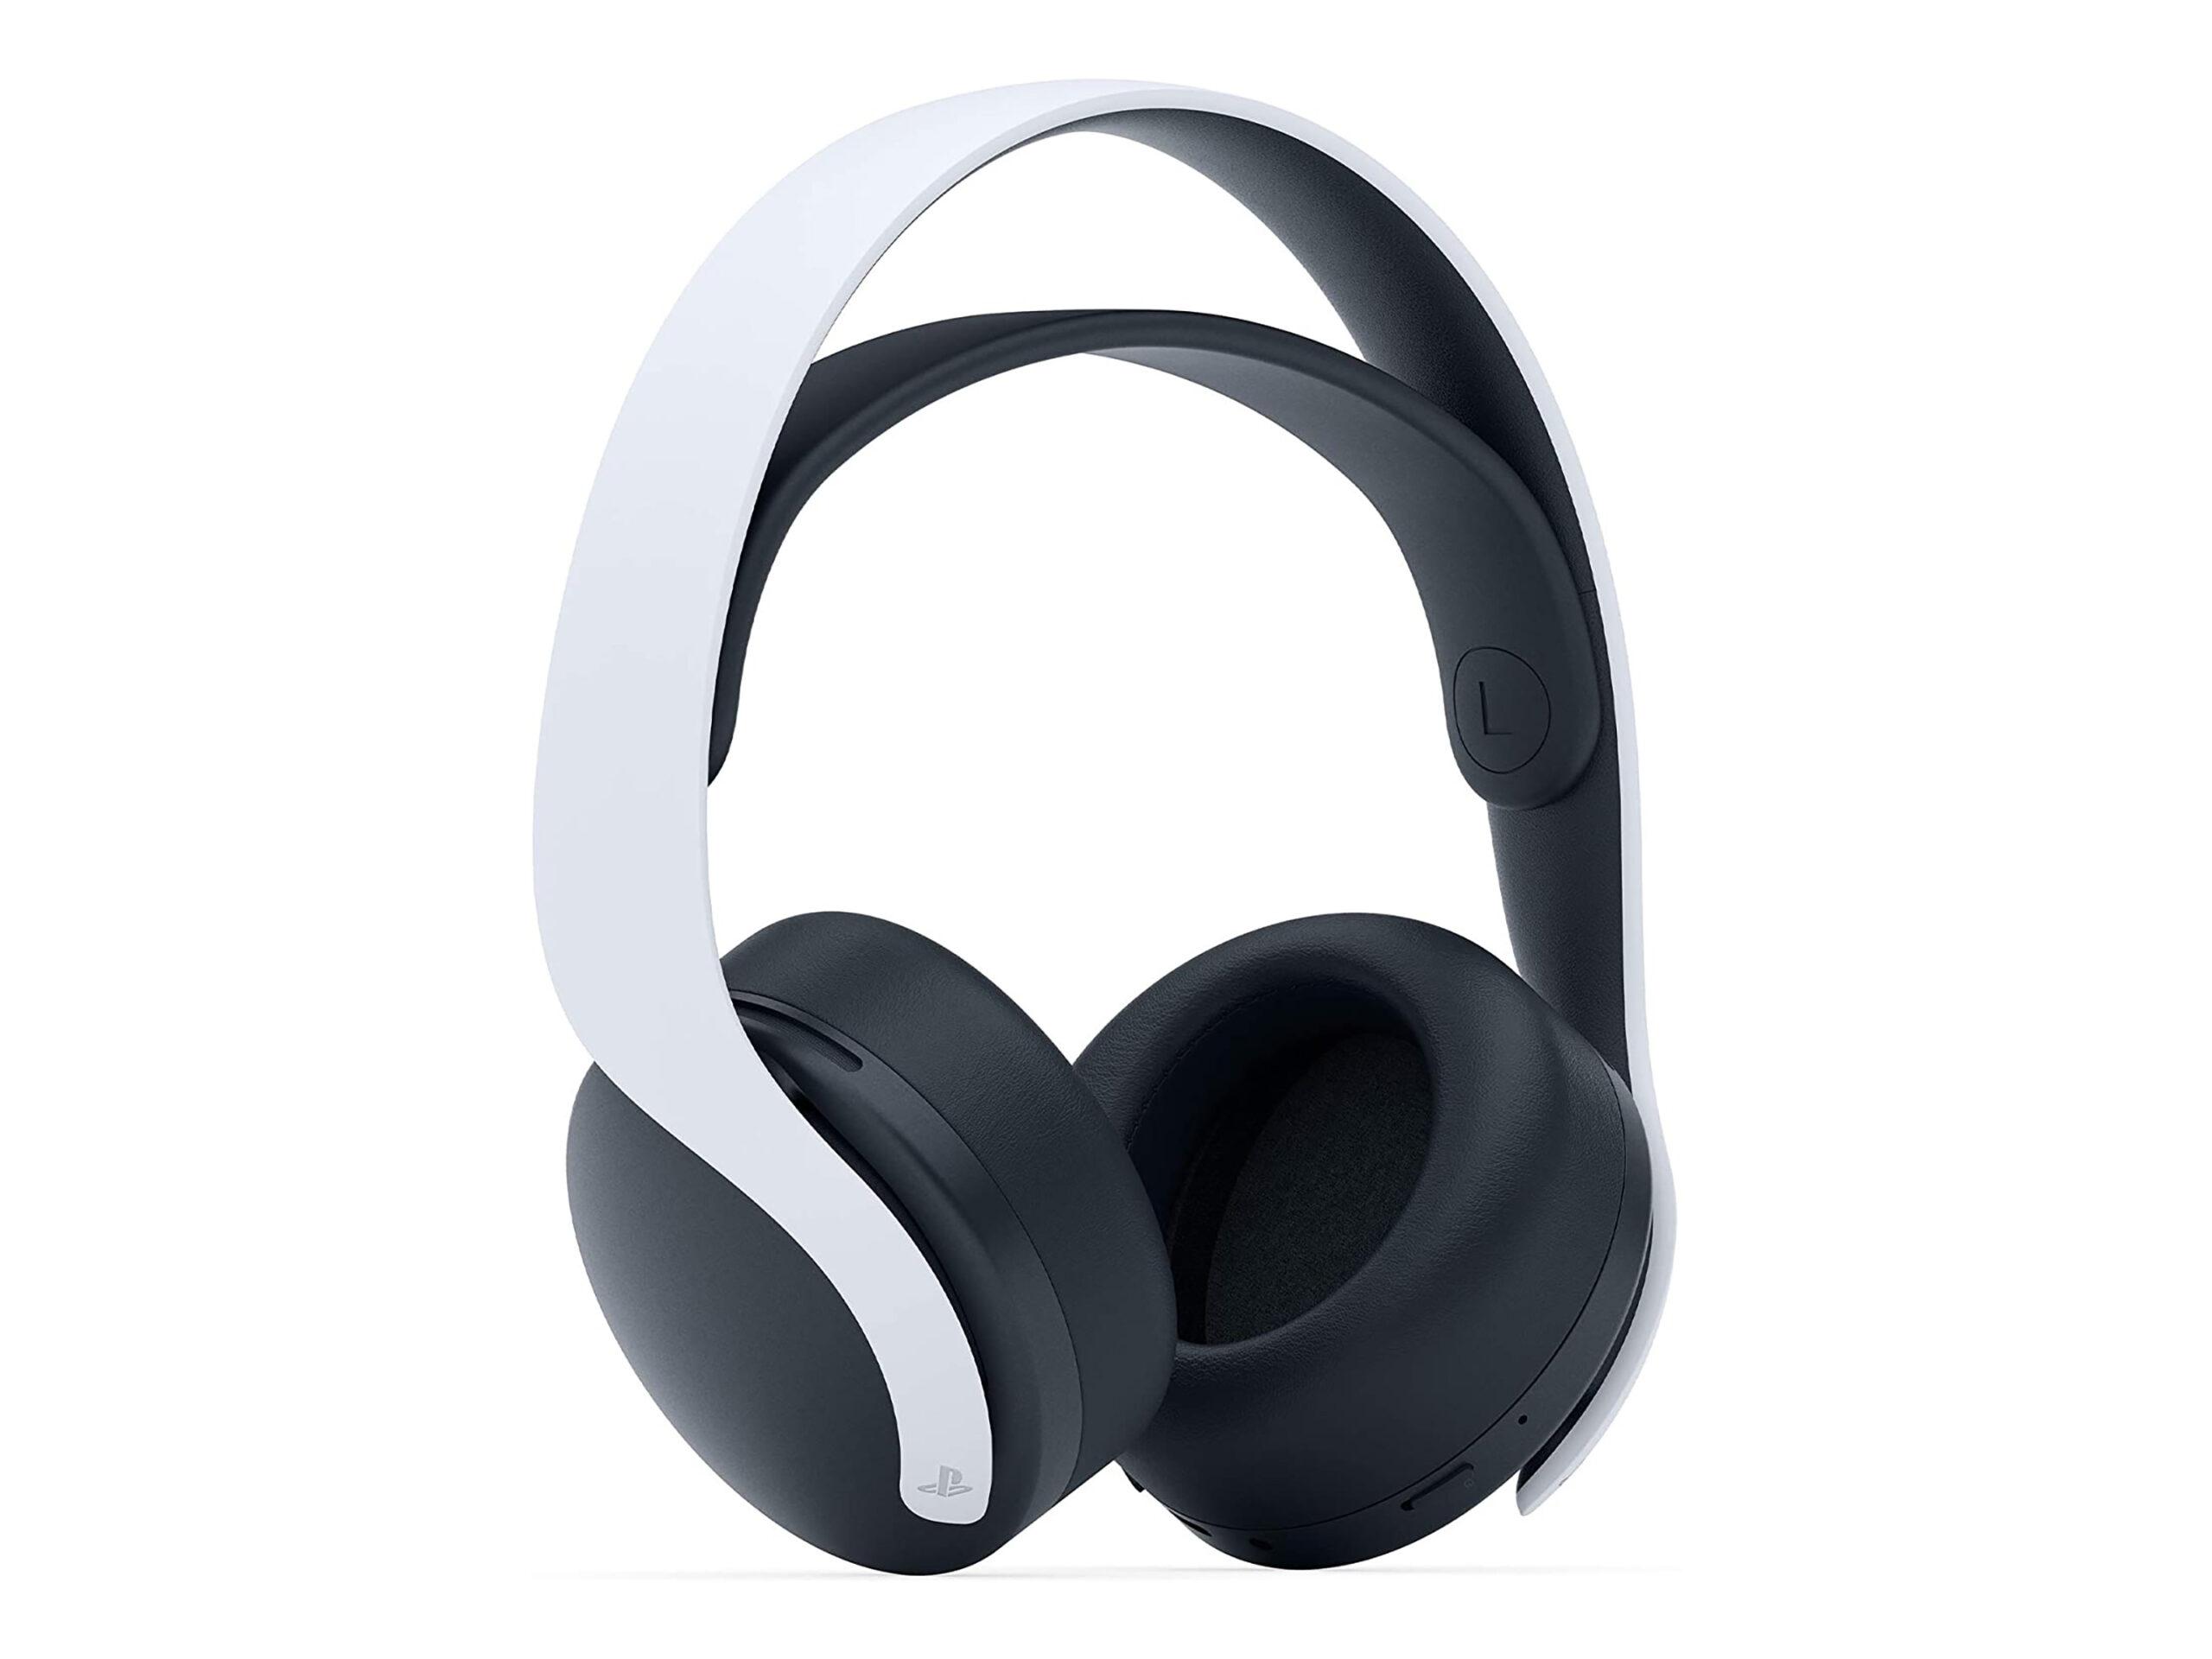 Playstation Pulse wireless headset